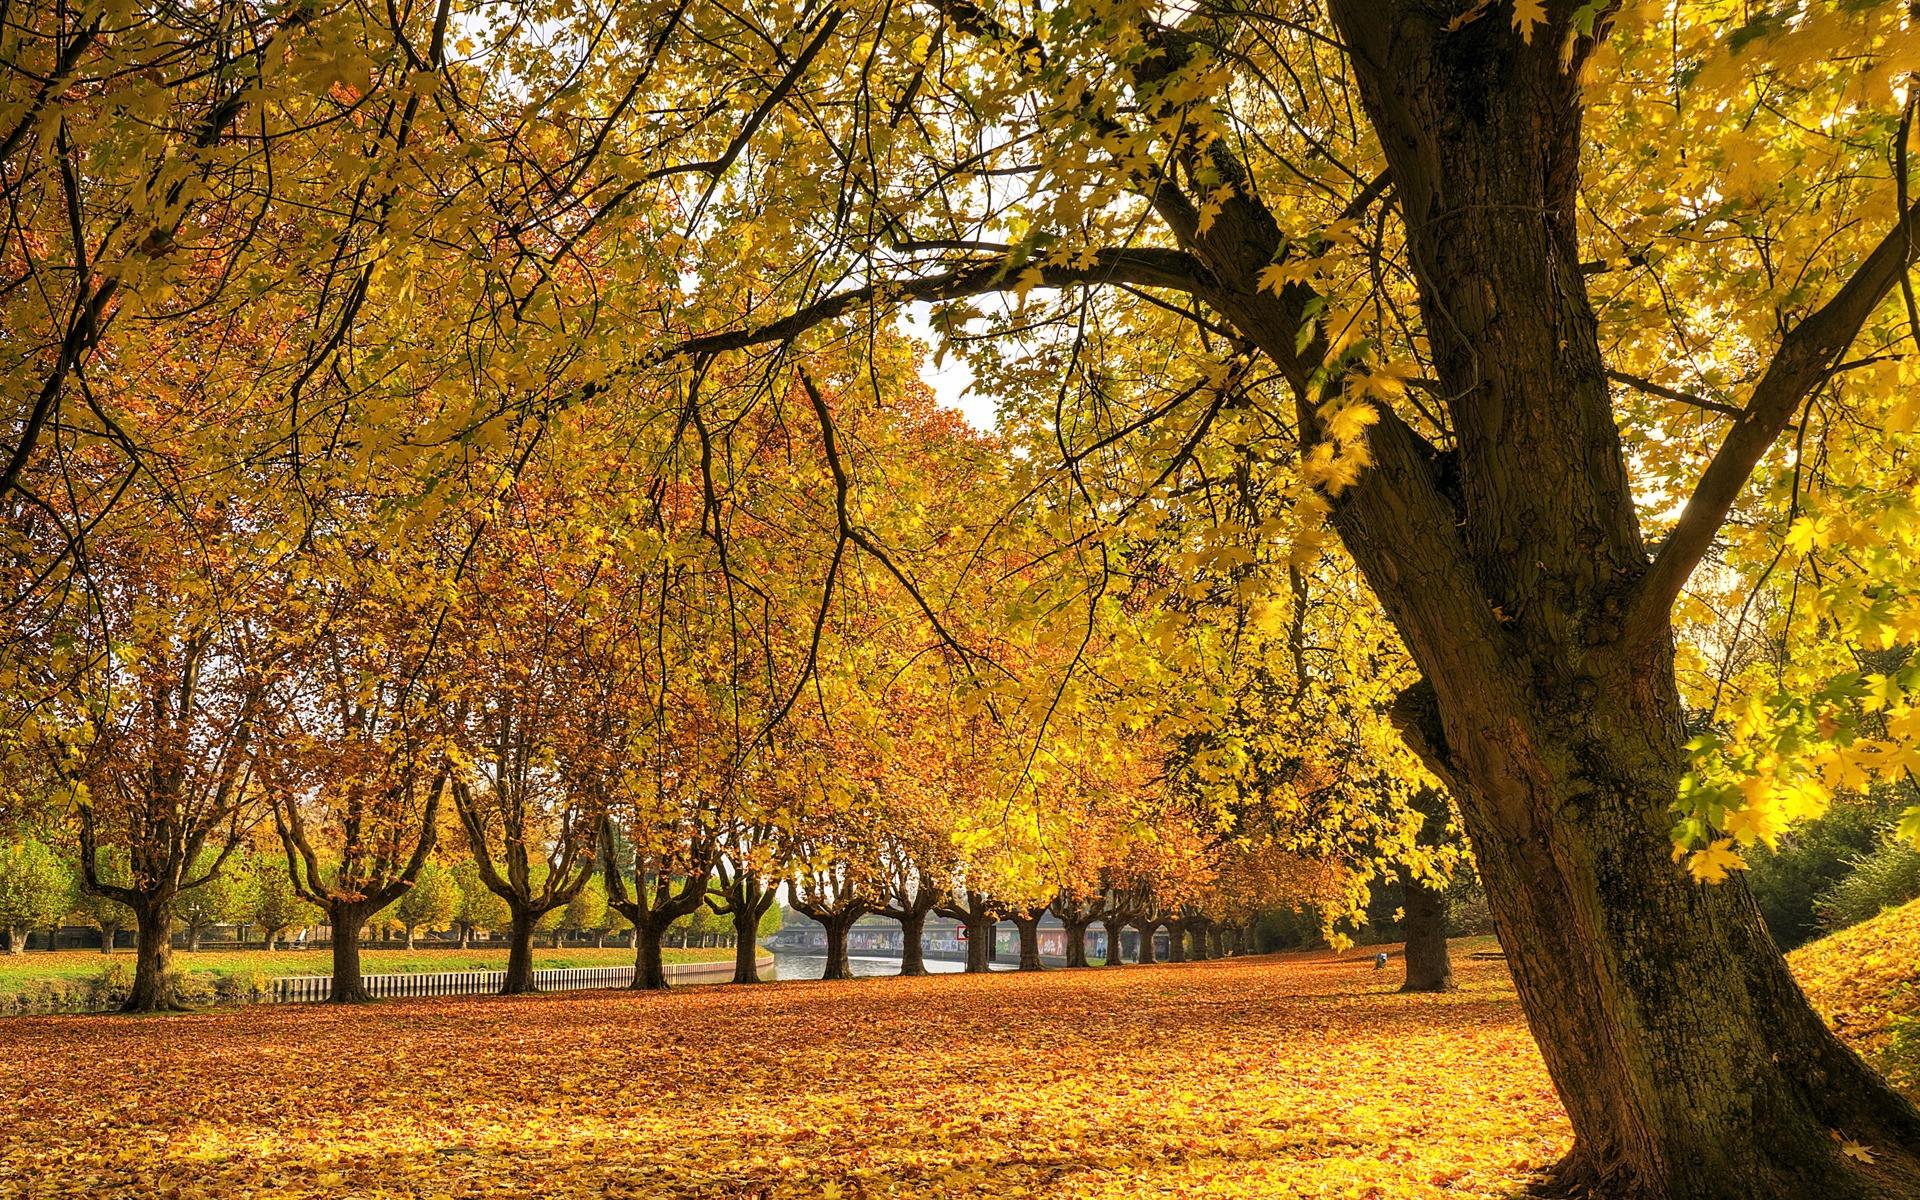 Golden Autumn Wallpaper Autumn Nature Wallpapers in jpg format for